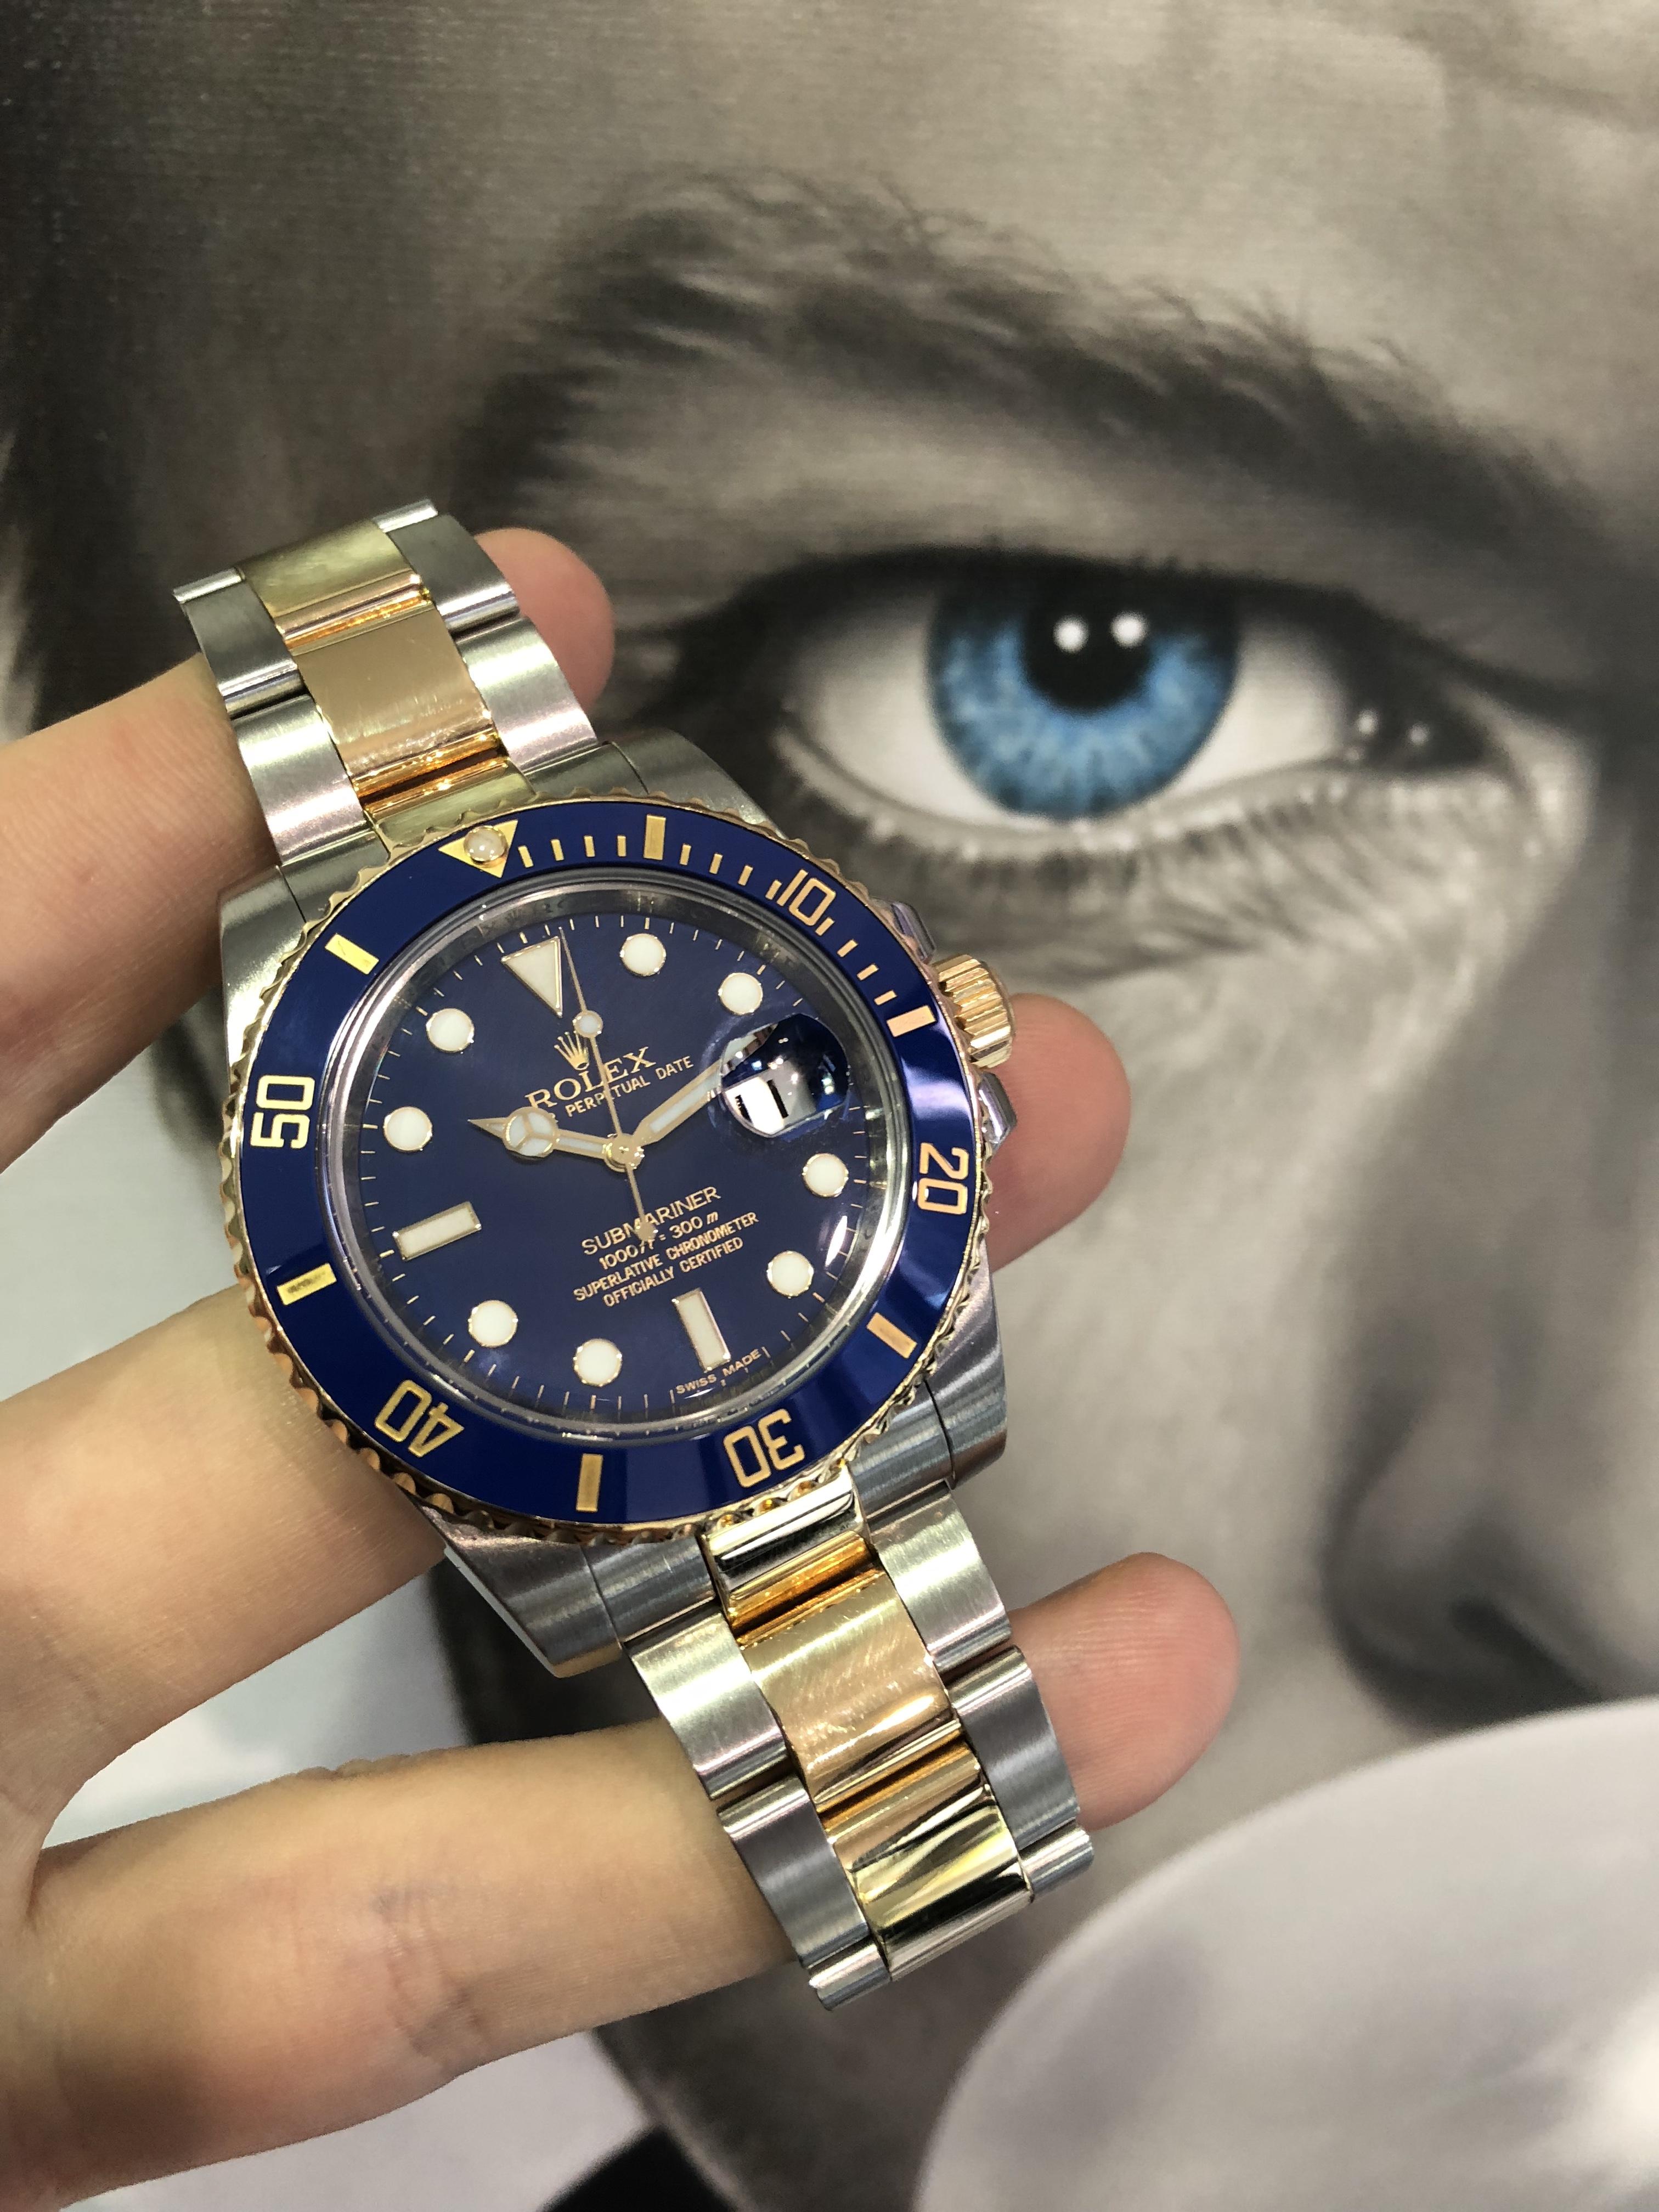 Rolex 116613 Submariner Steel & Gold Ceramic bezel - Carr ...